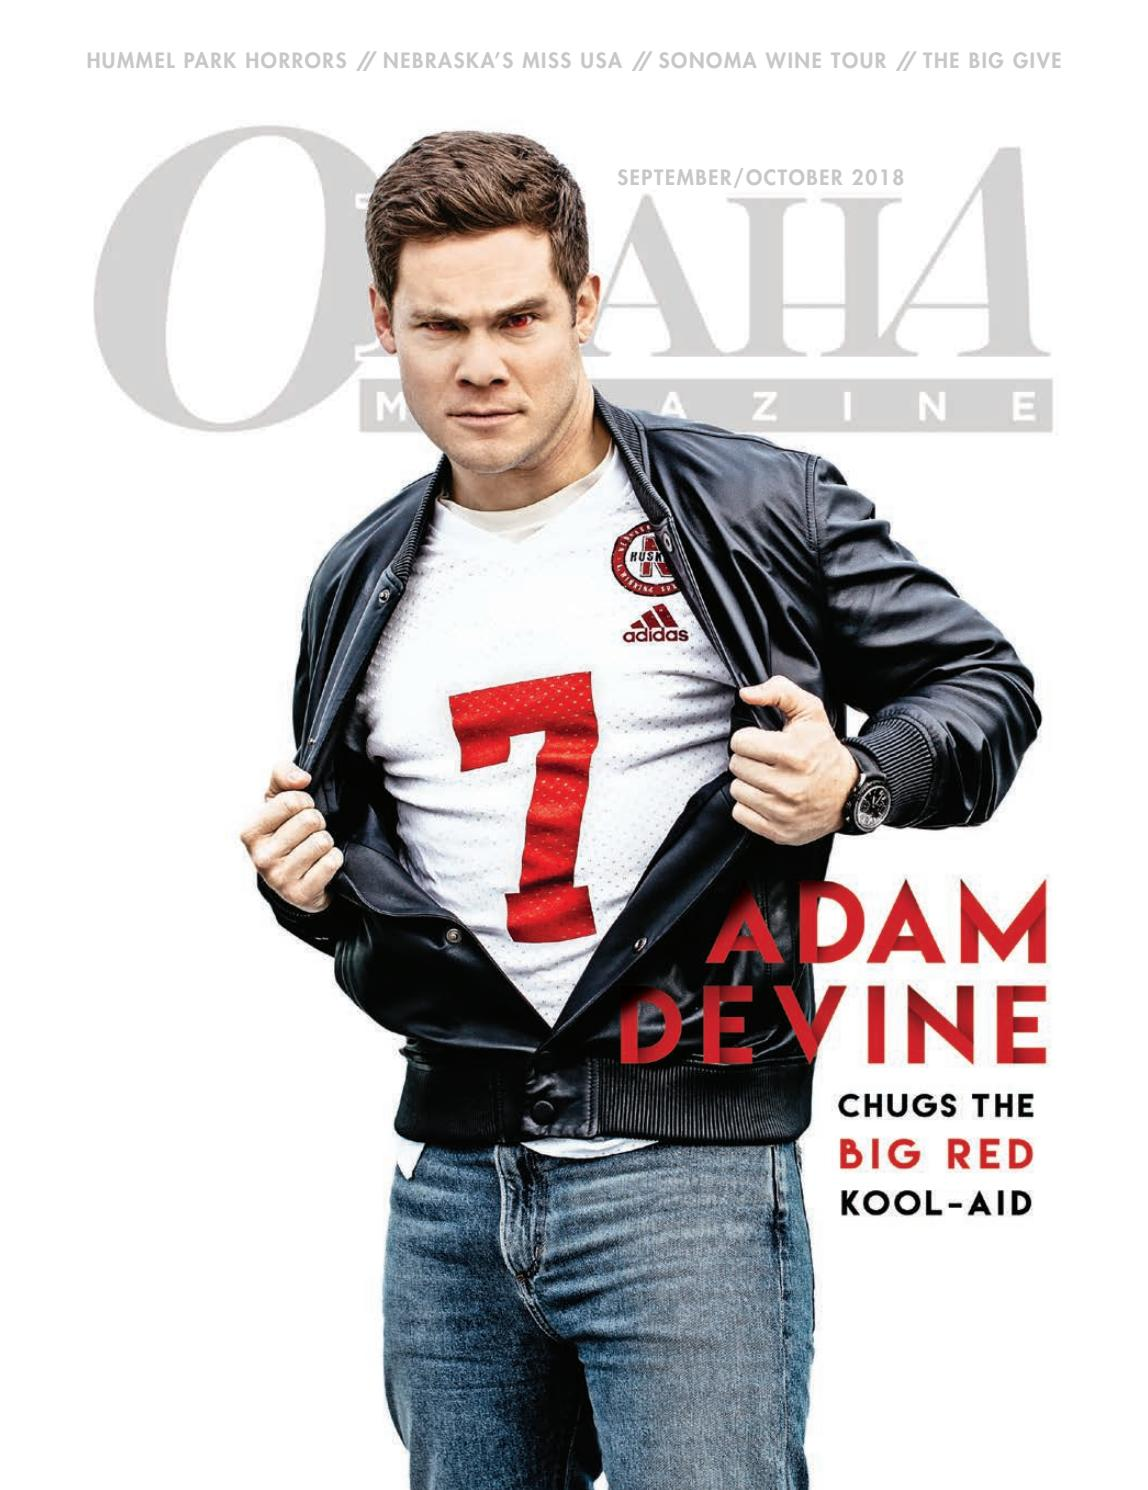 50d6ea6d16860 September/October 2018 Omaha Magazine by Omaha Magazine - issuu